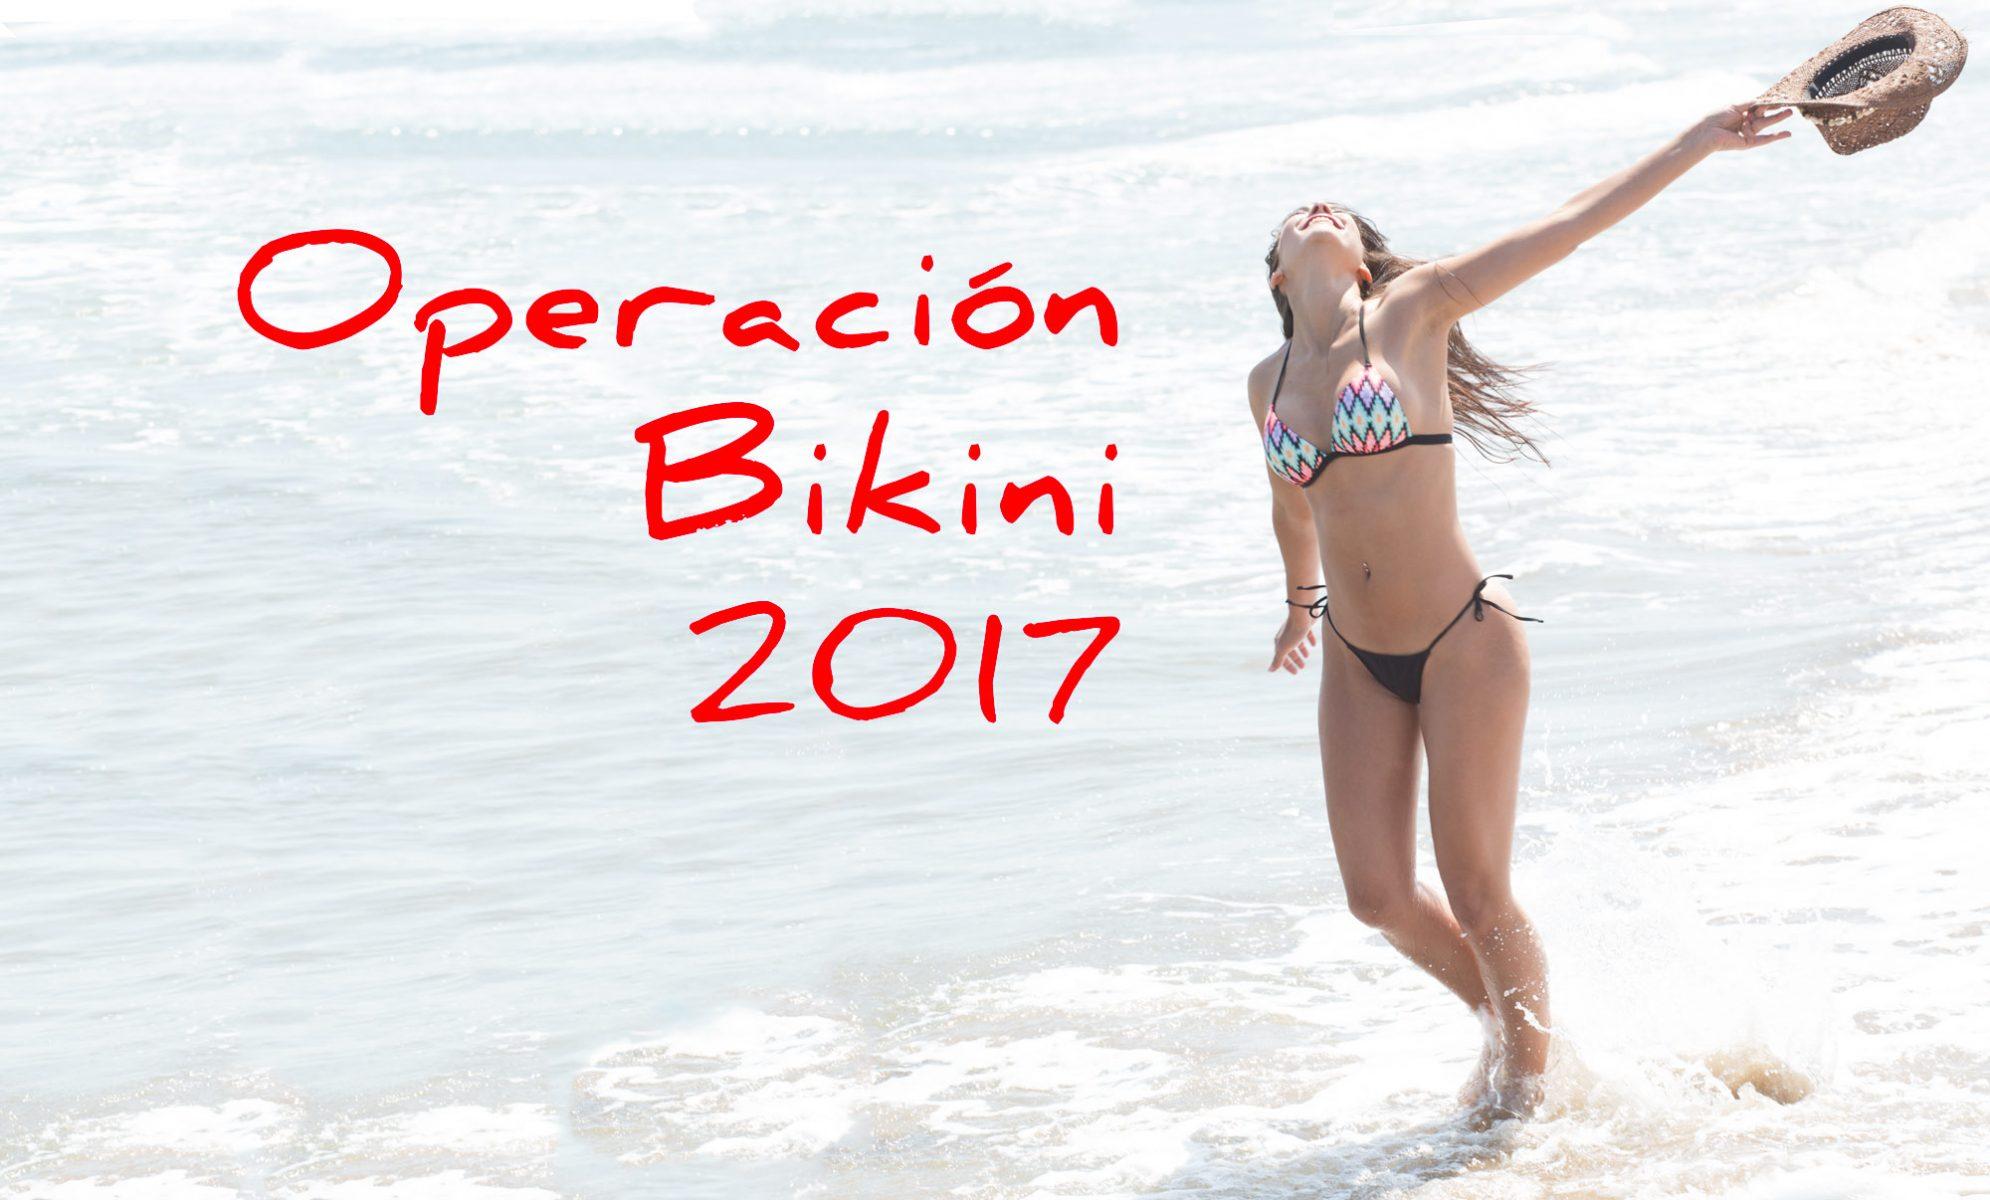 Operación Bikini 2017